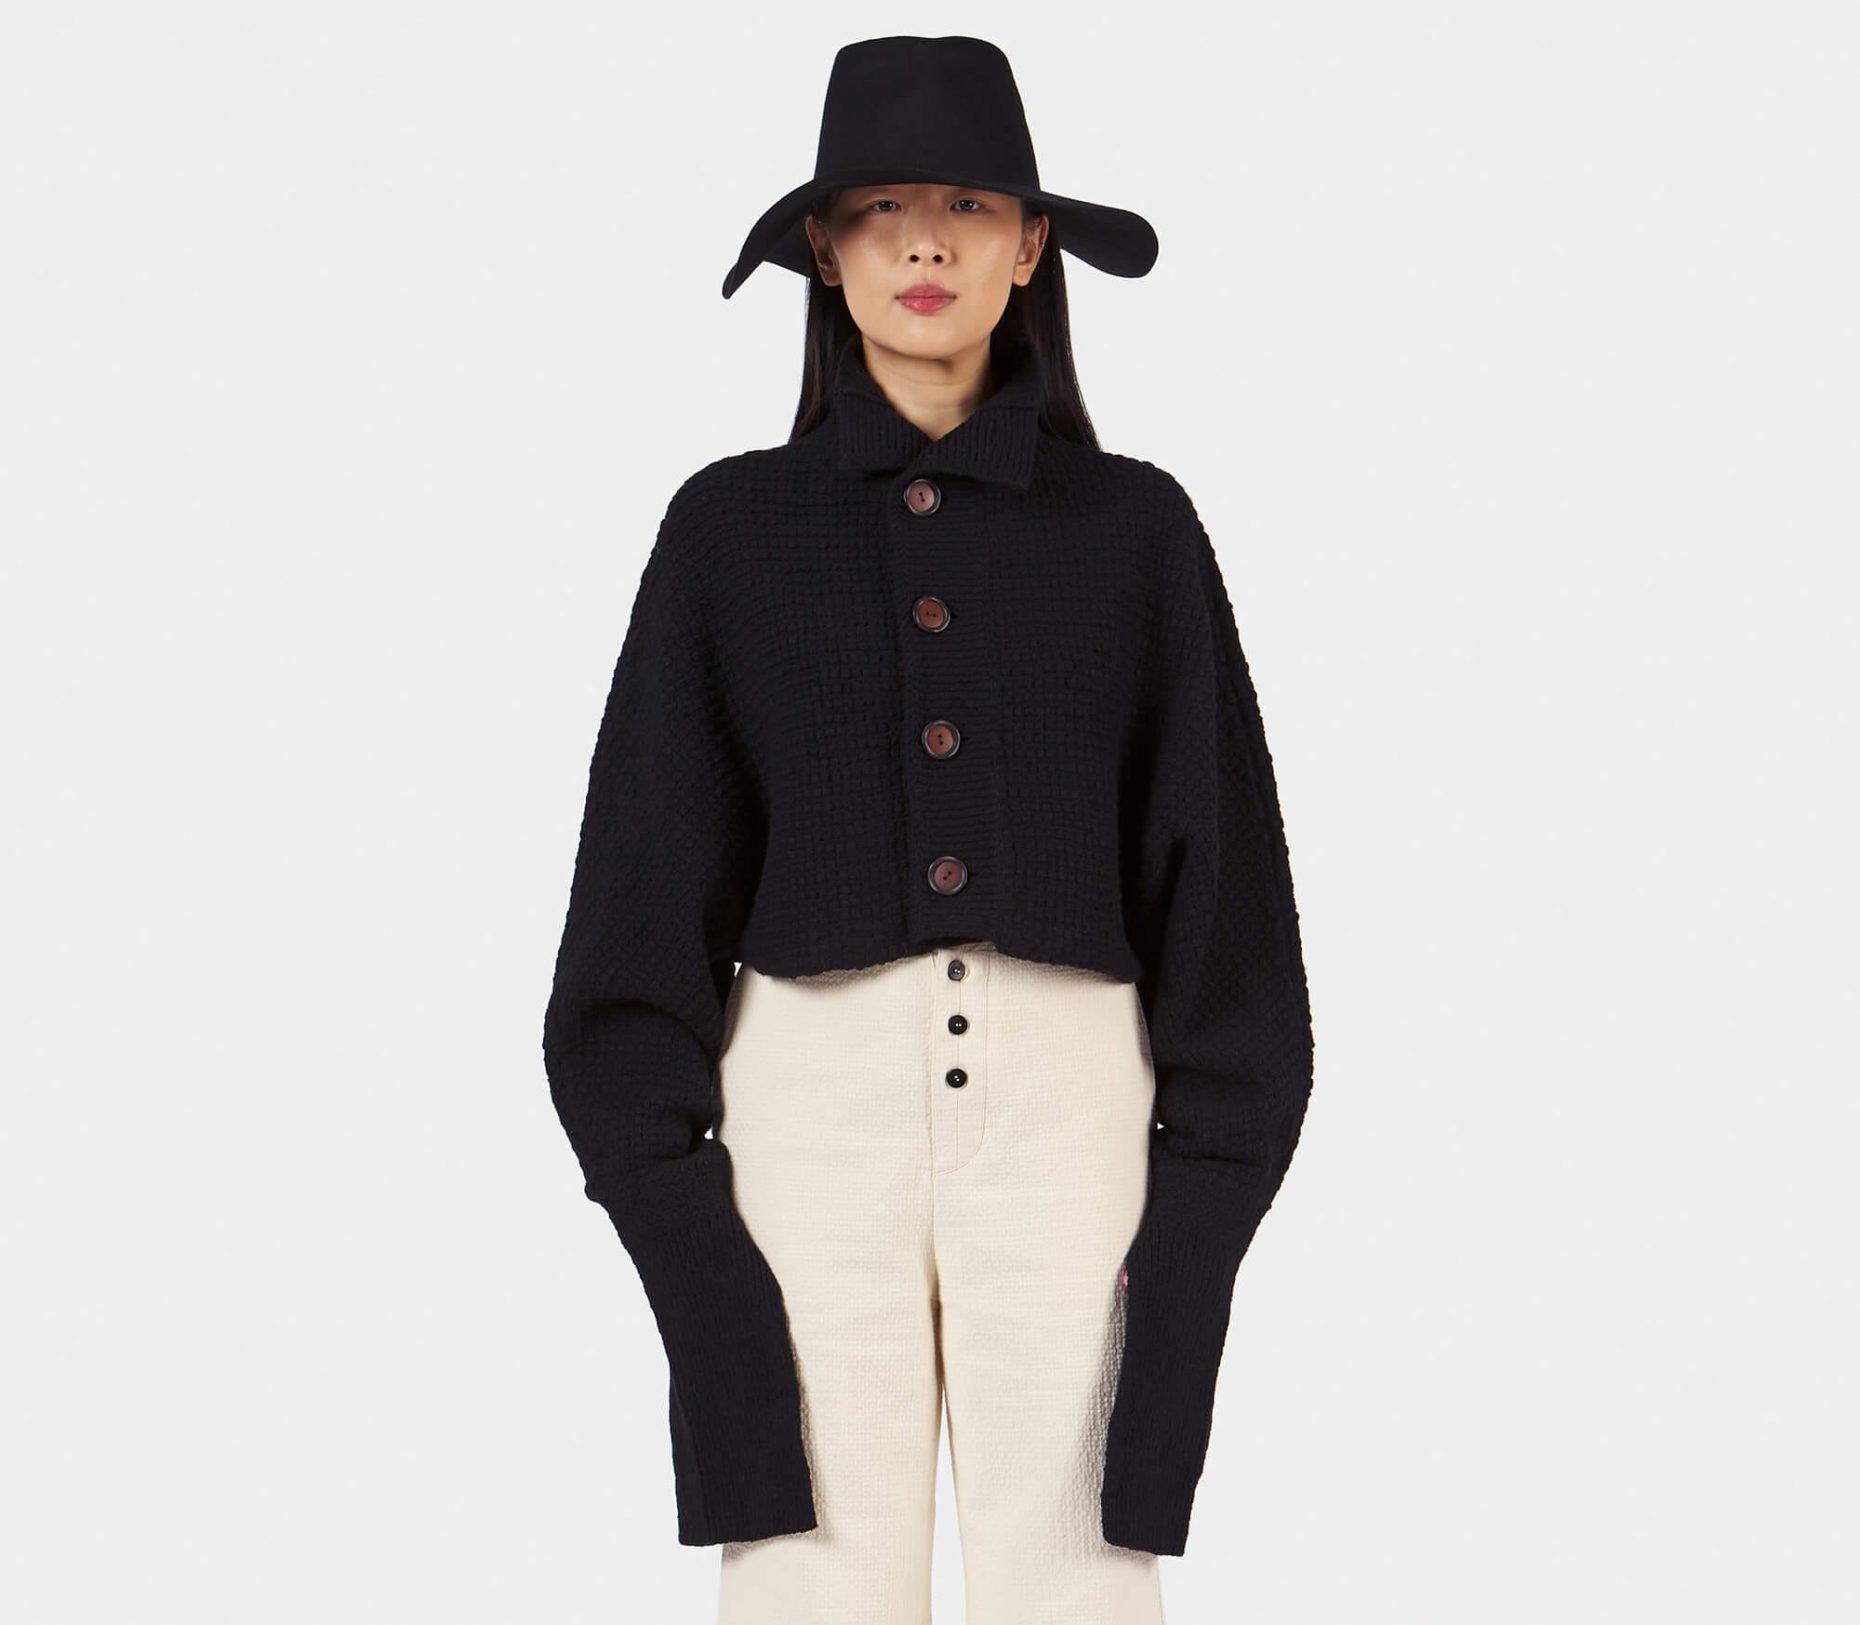 Taiga Takahashi Black Cropped Bolero Cardigan